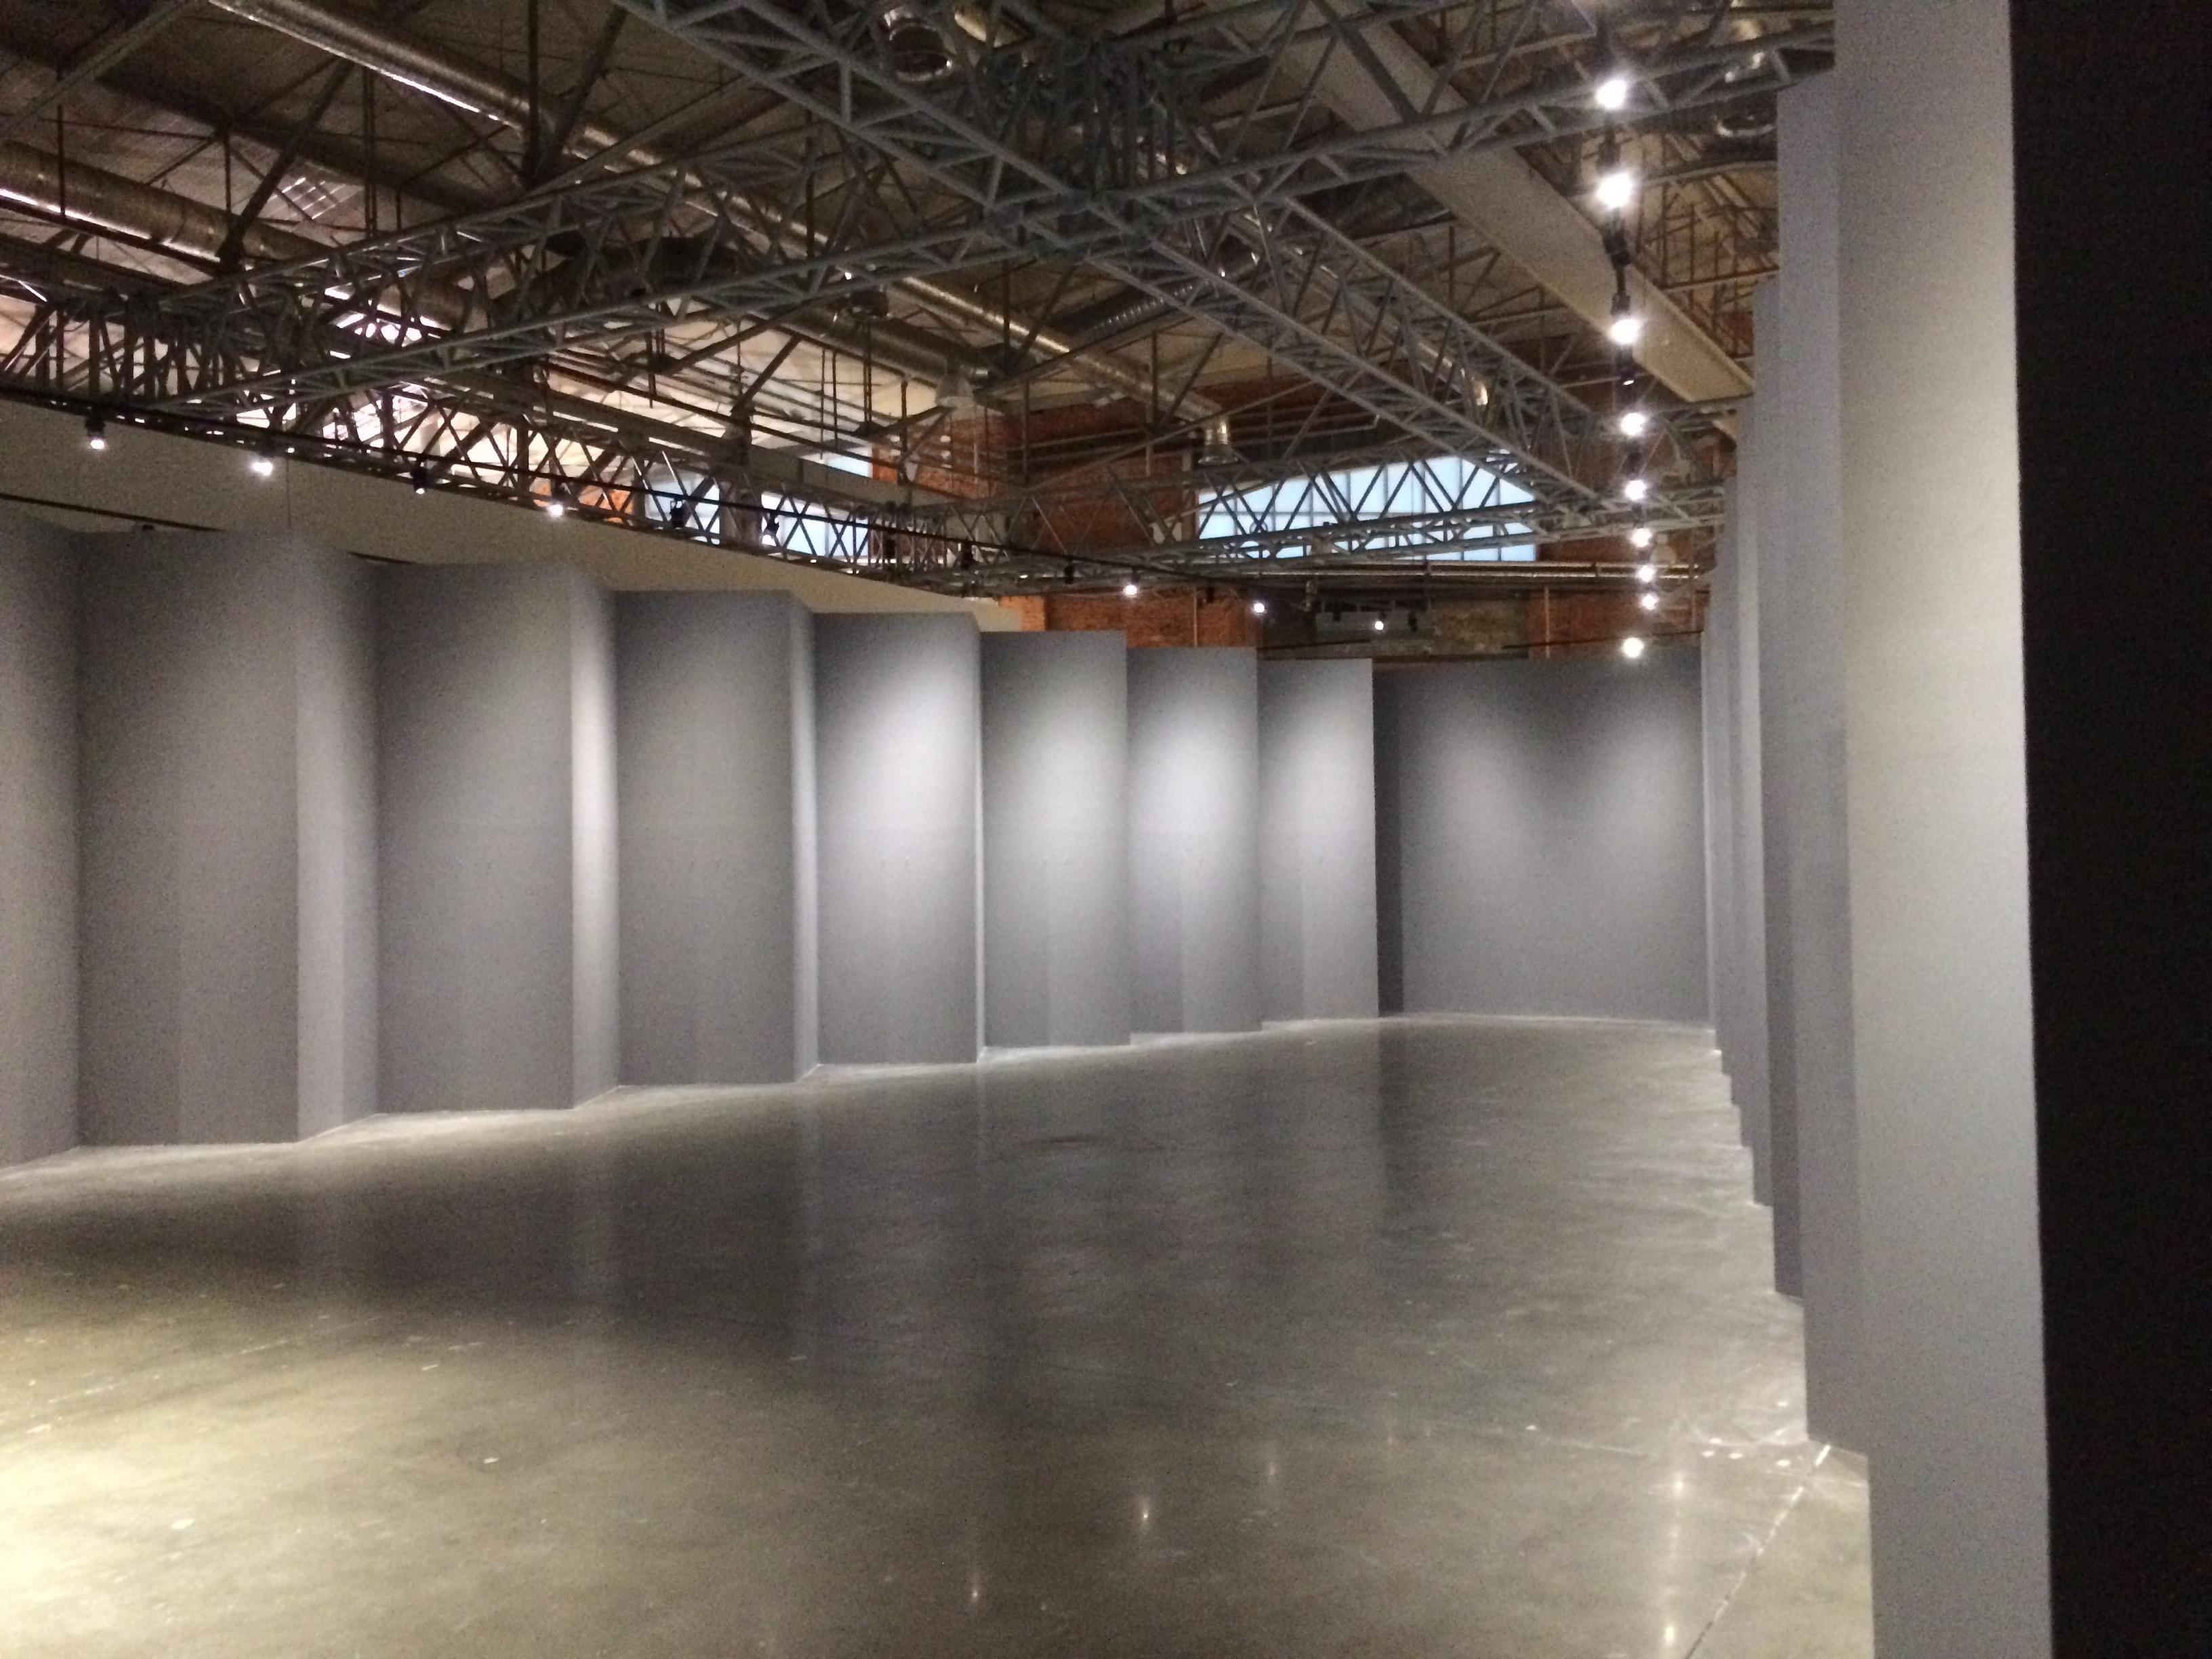 Музей Толирантности